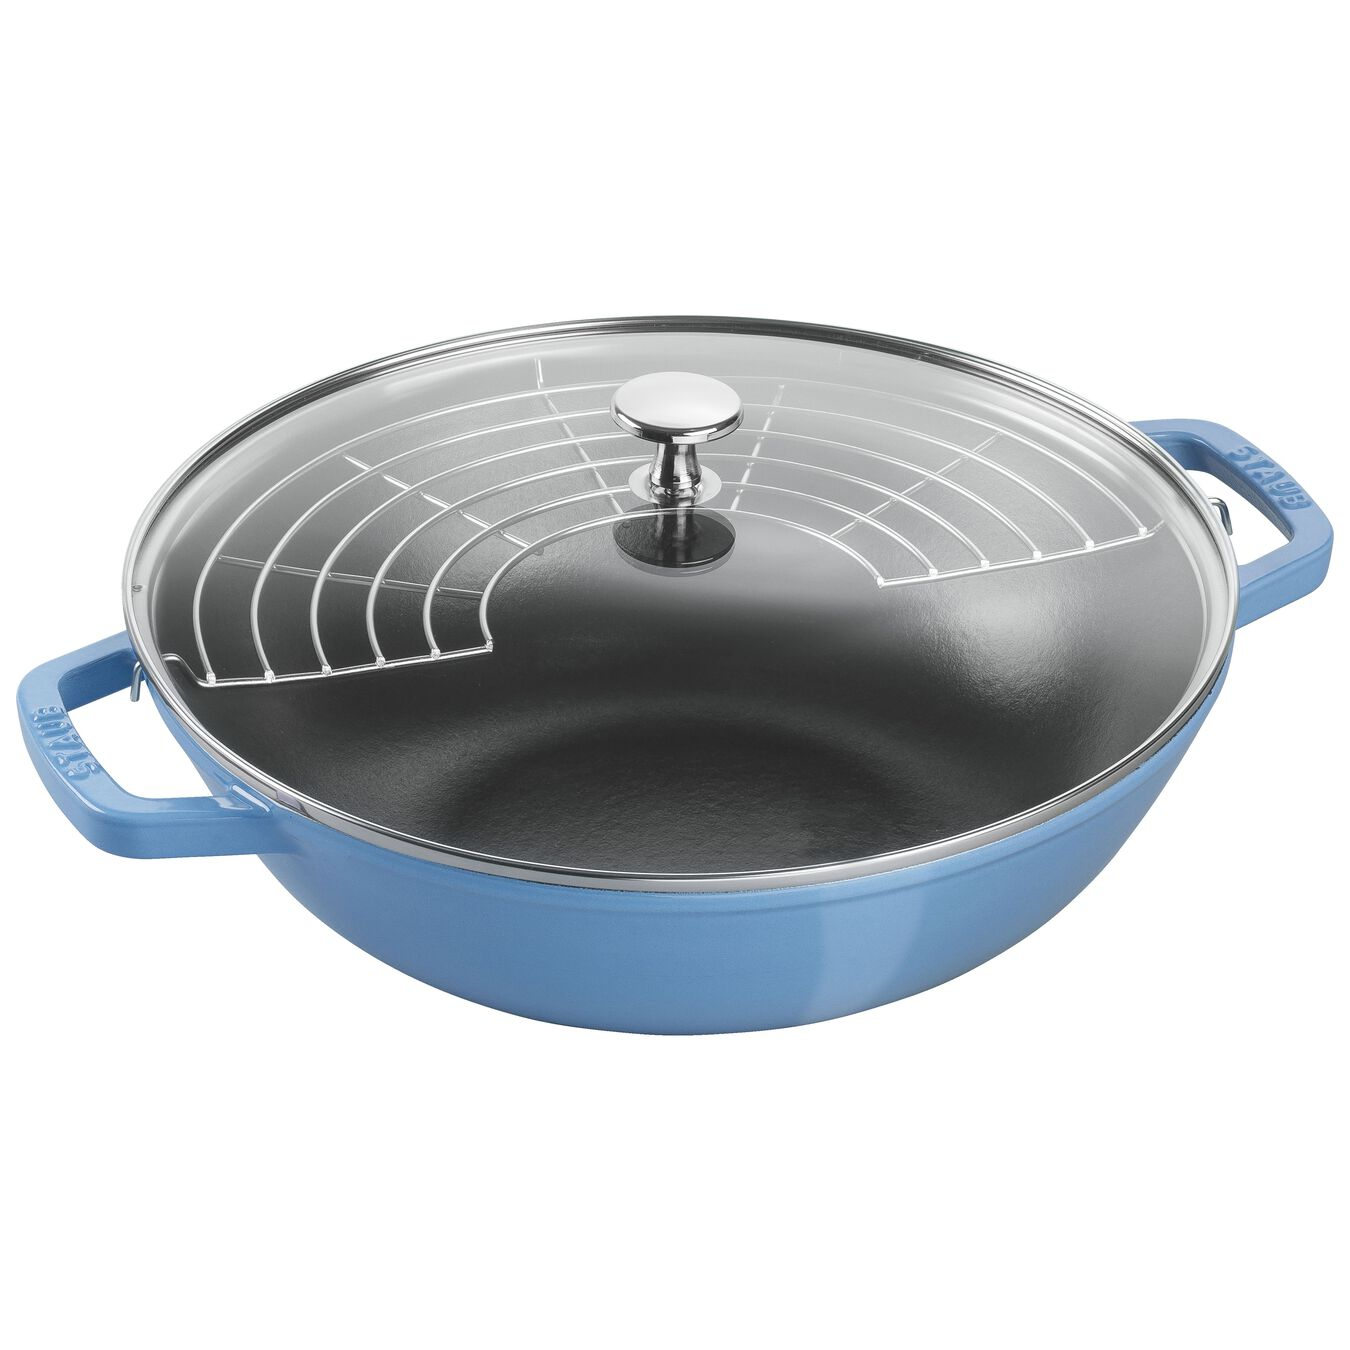 30 cm / 12 inch Cast iron Wok, ice-blue,,large 1